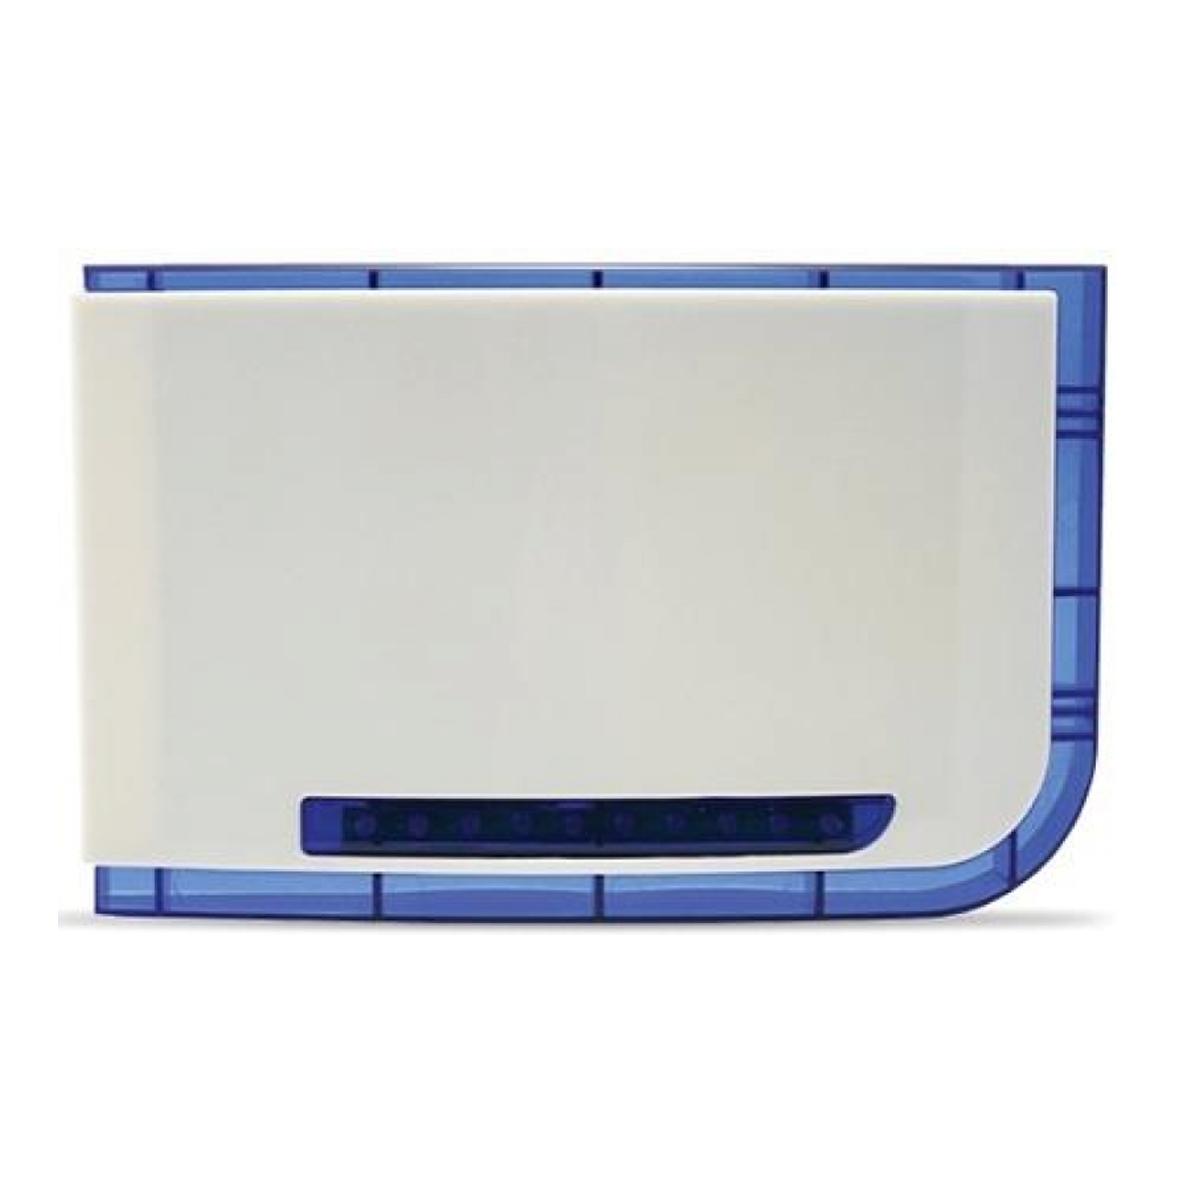 Sirene Exterior XTEC BRANCA/AZUL G3